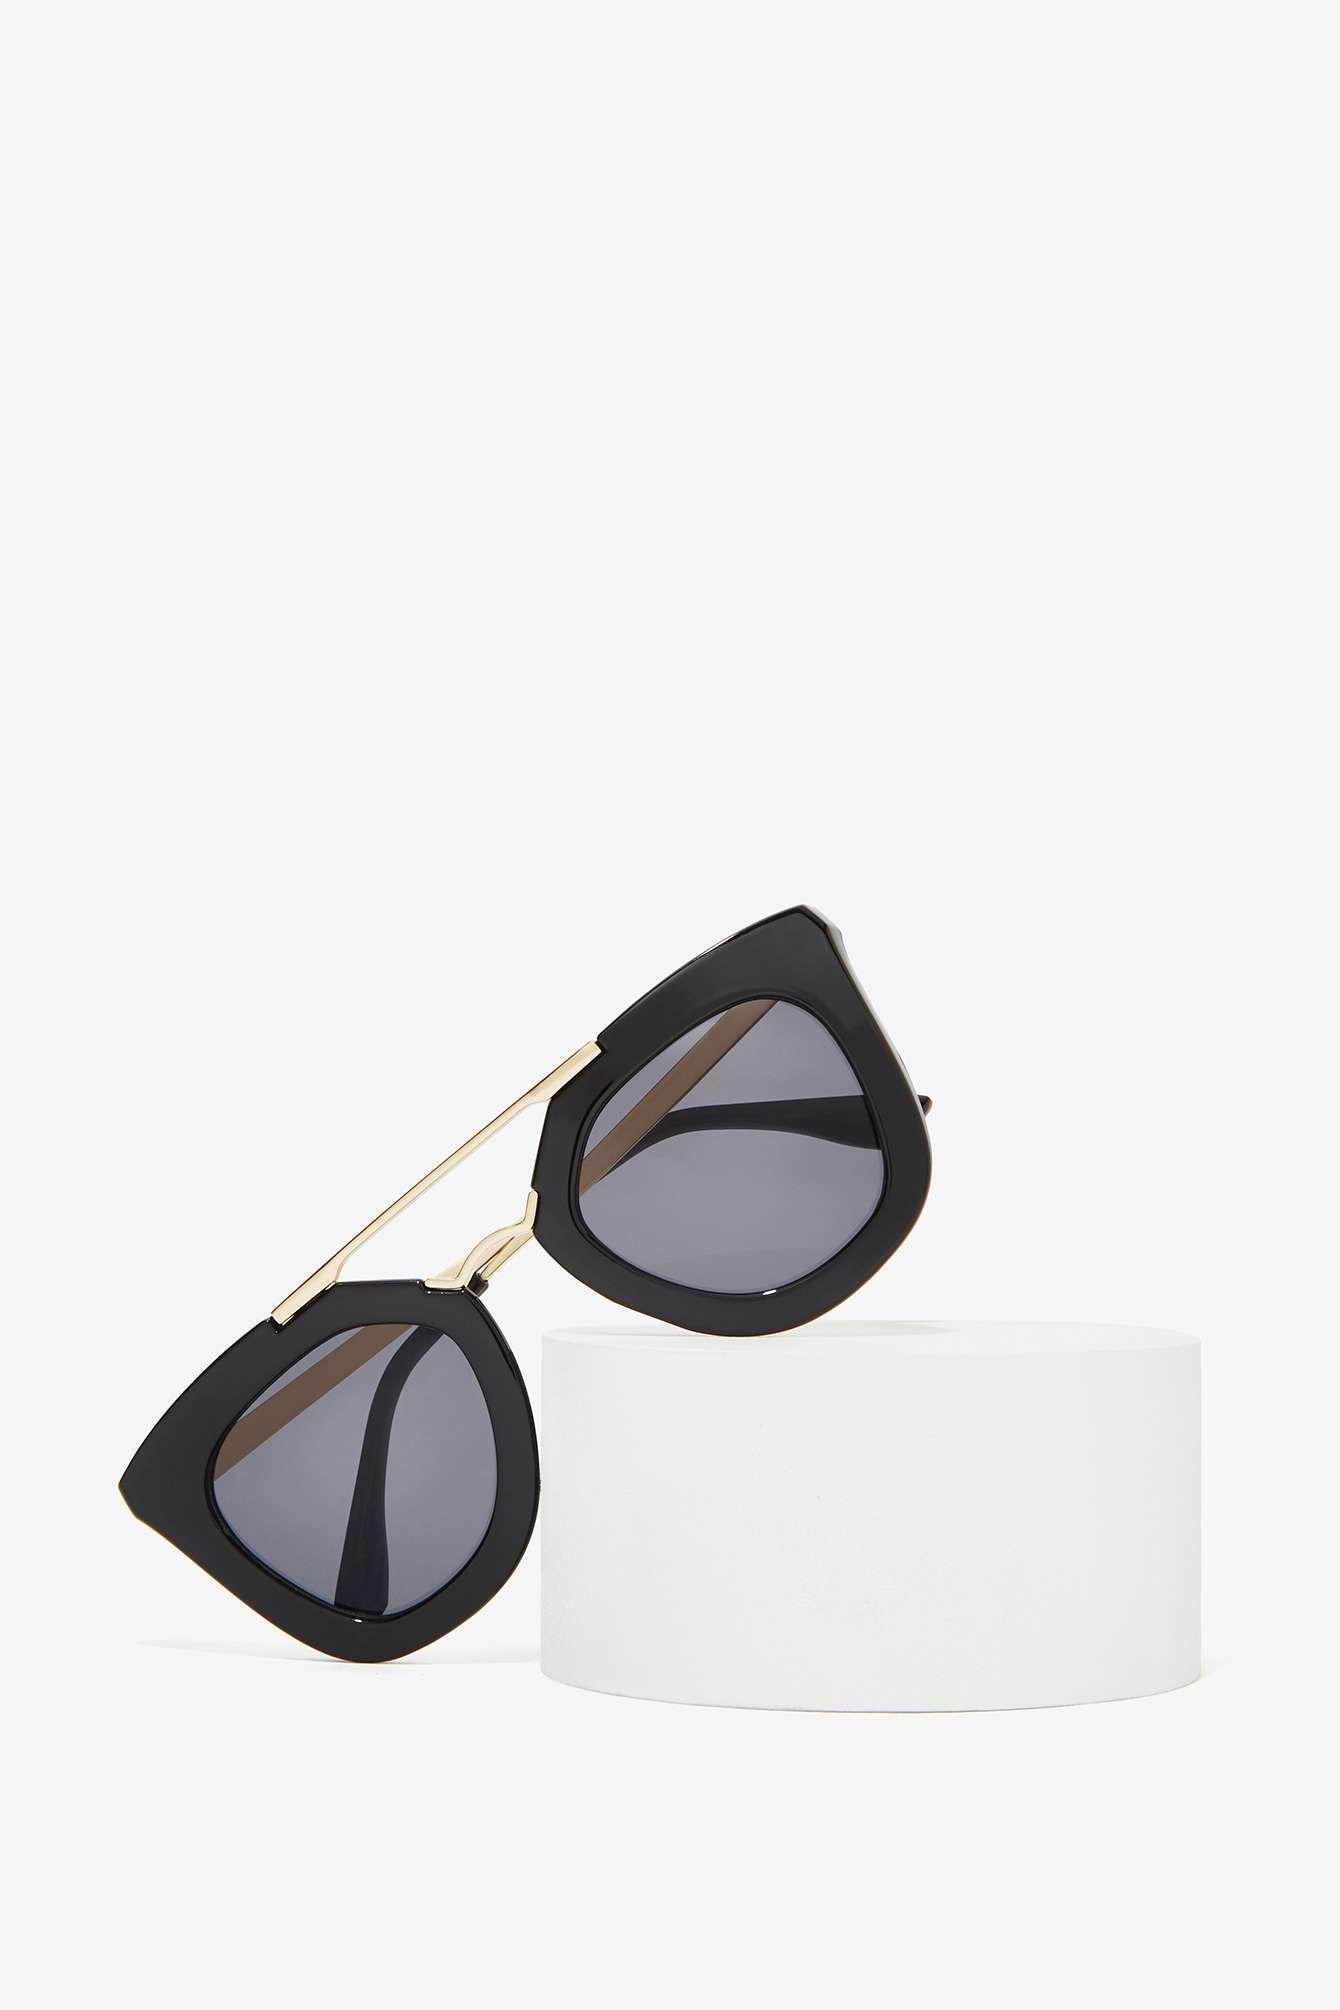 8d2acd1ab Accessories | Shop Women's Fashion Accessories. Óculos De SolModelos ...